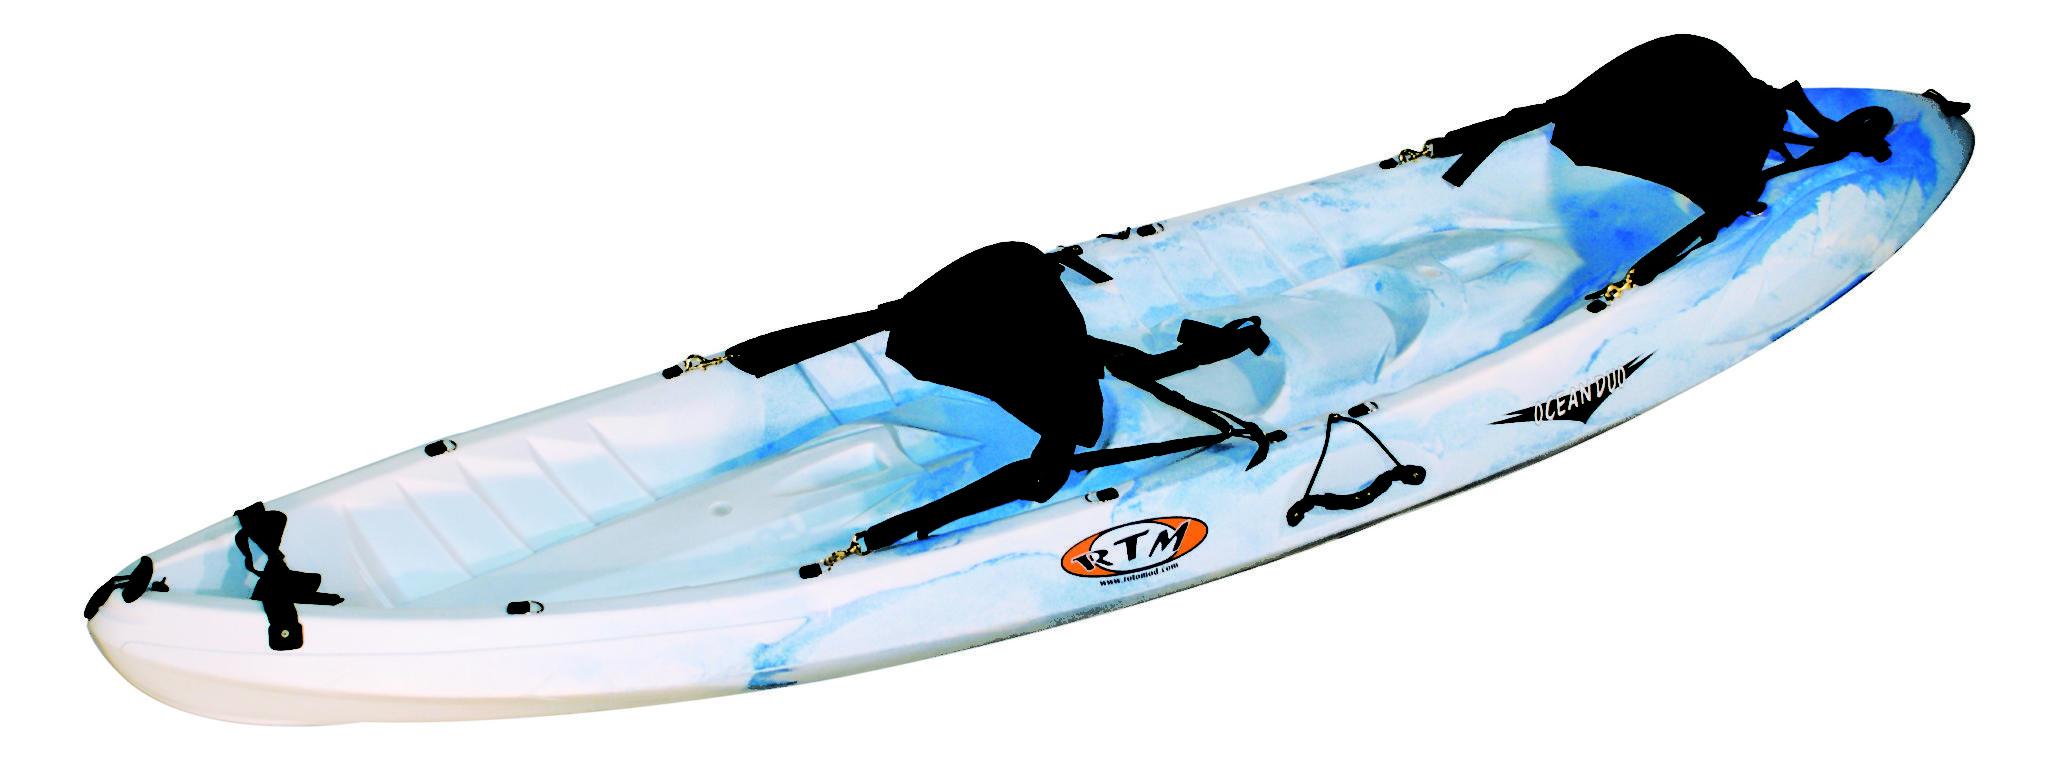 Kayak pesca segunda mano barcelona - Taburetes segunda mano barcelona ...